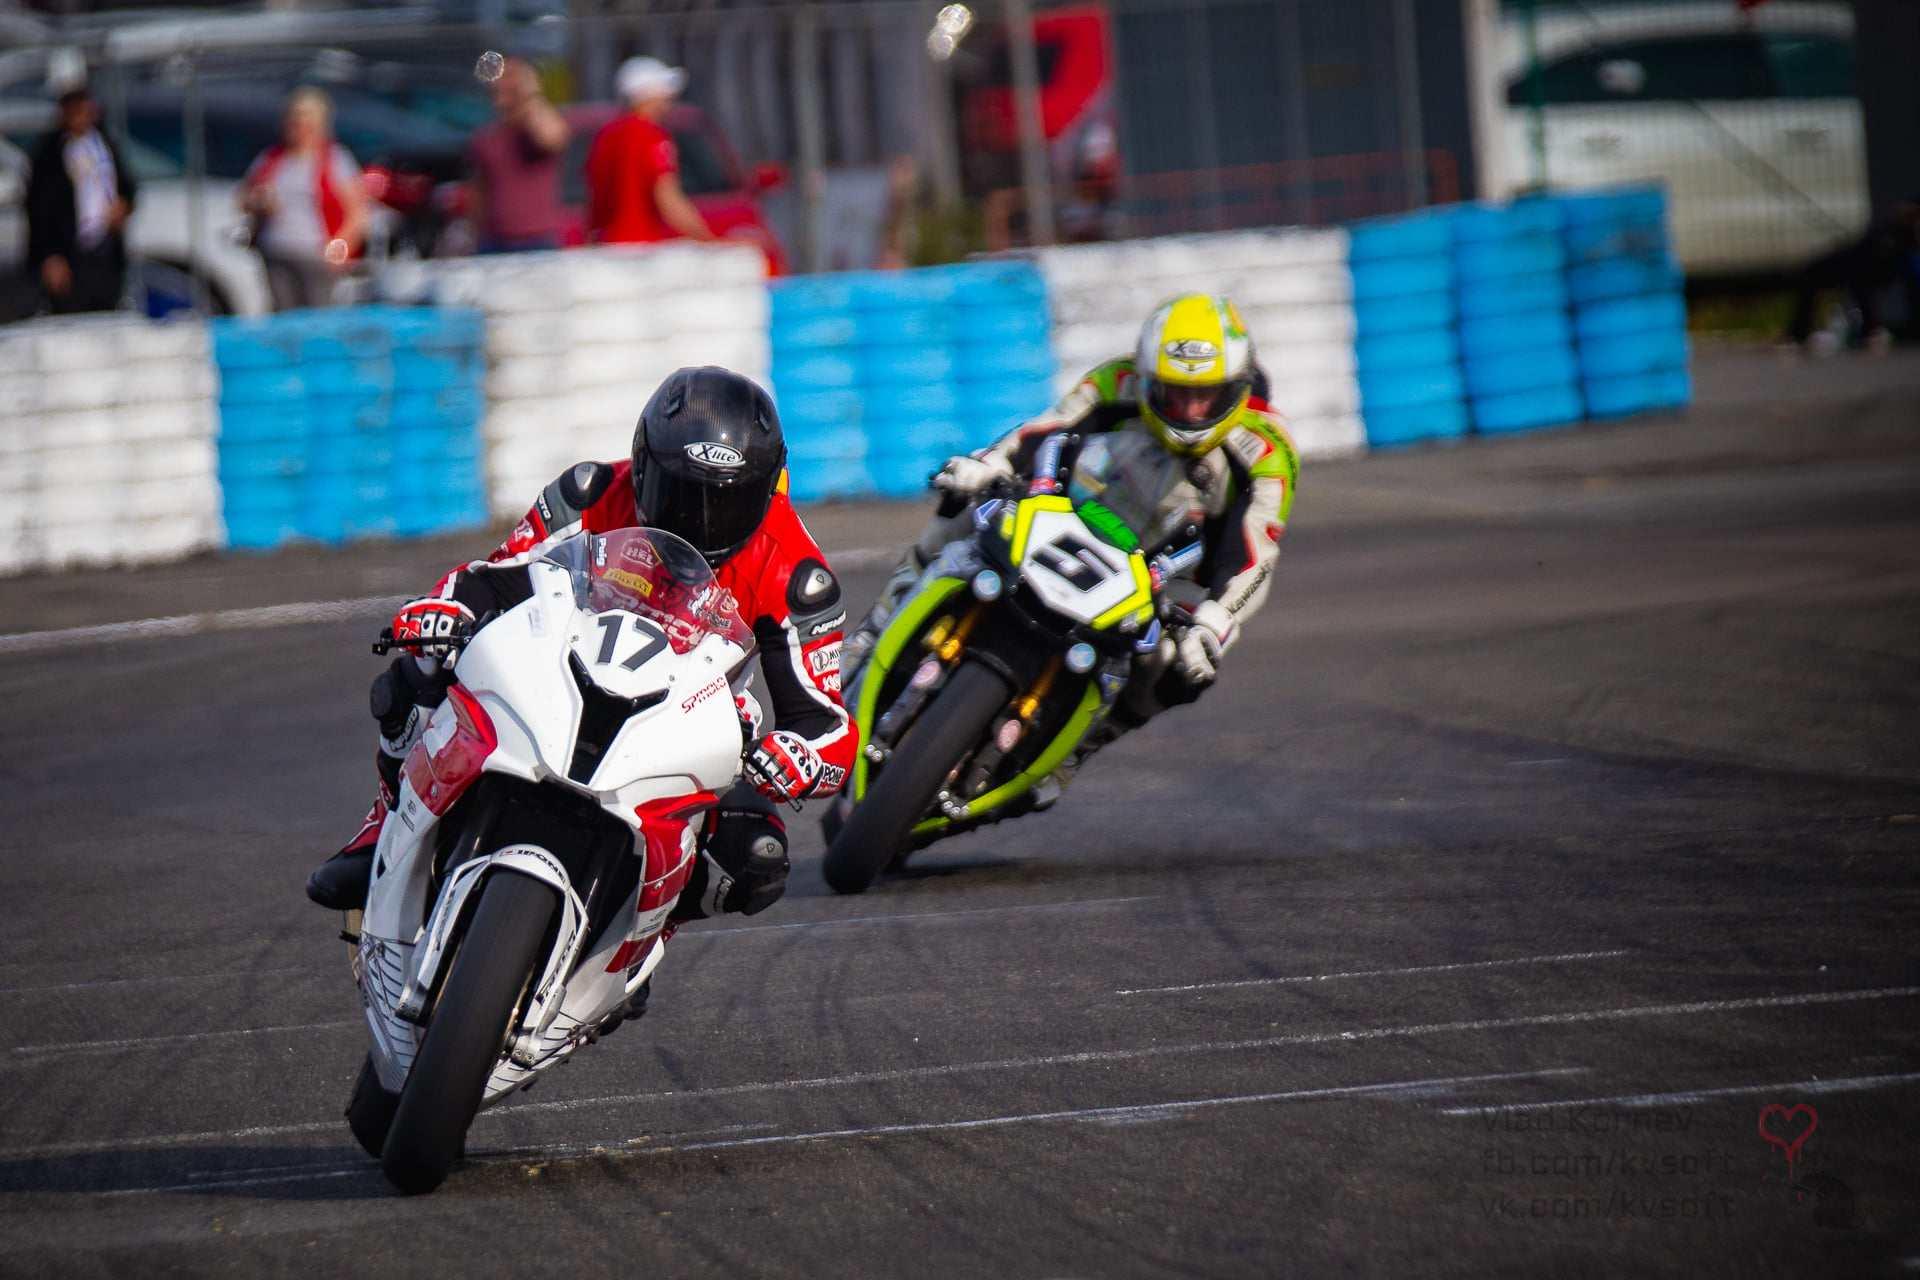 5-6_etap_MotoGPUkraine_168